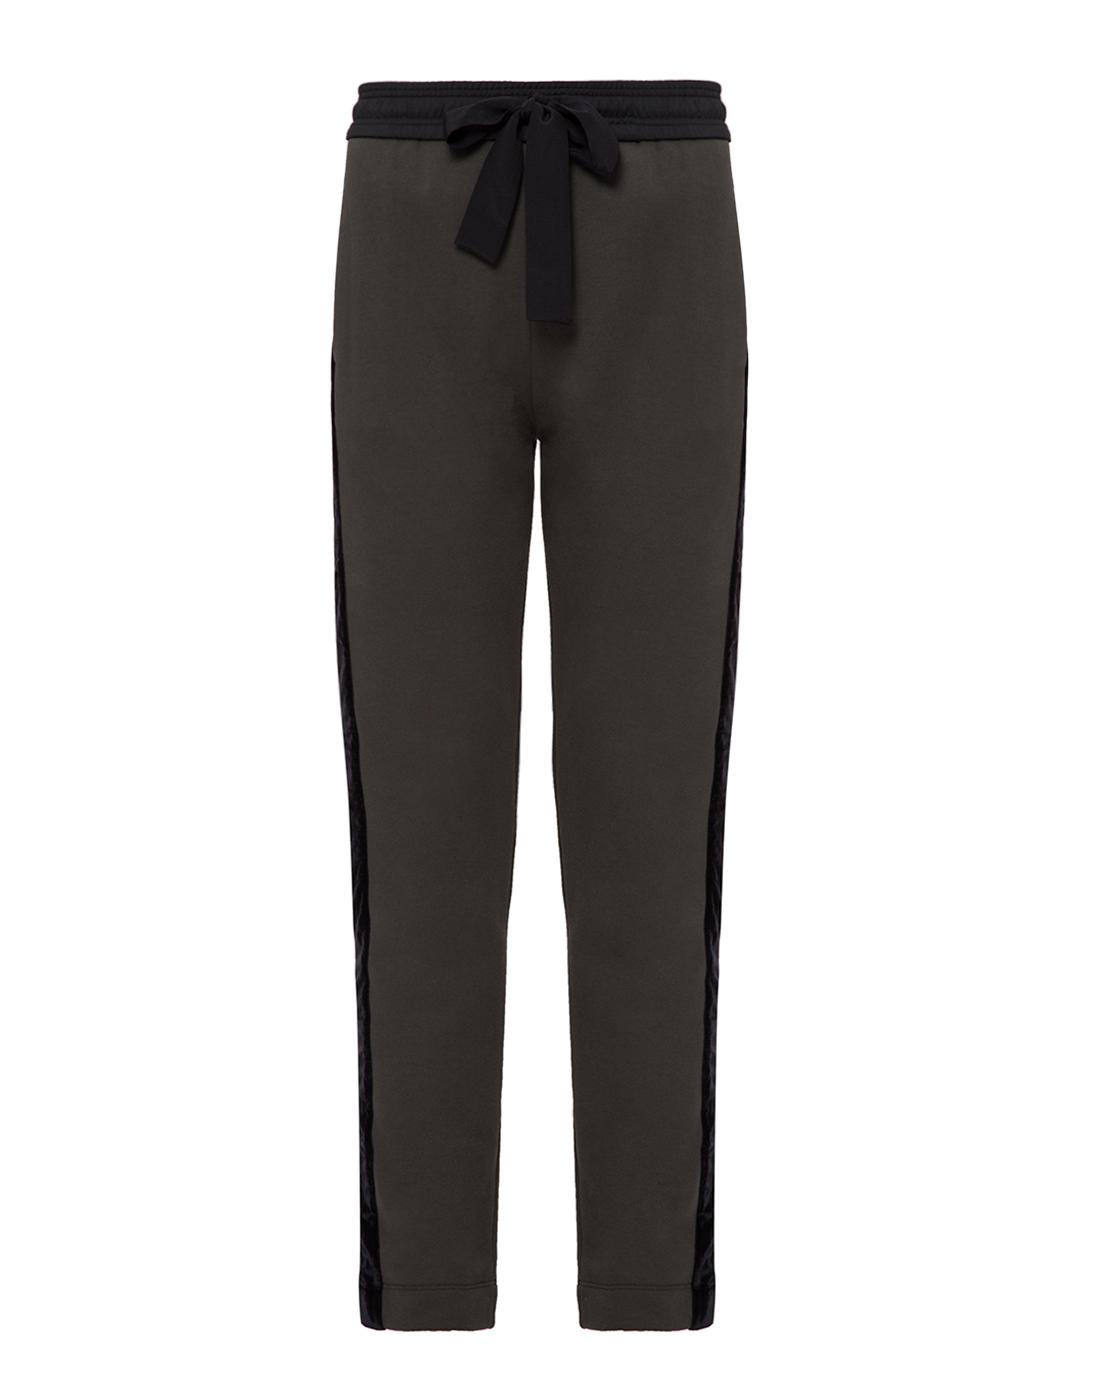 Женские зеленые брюки Dorothee Schumacher S128002-1